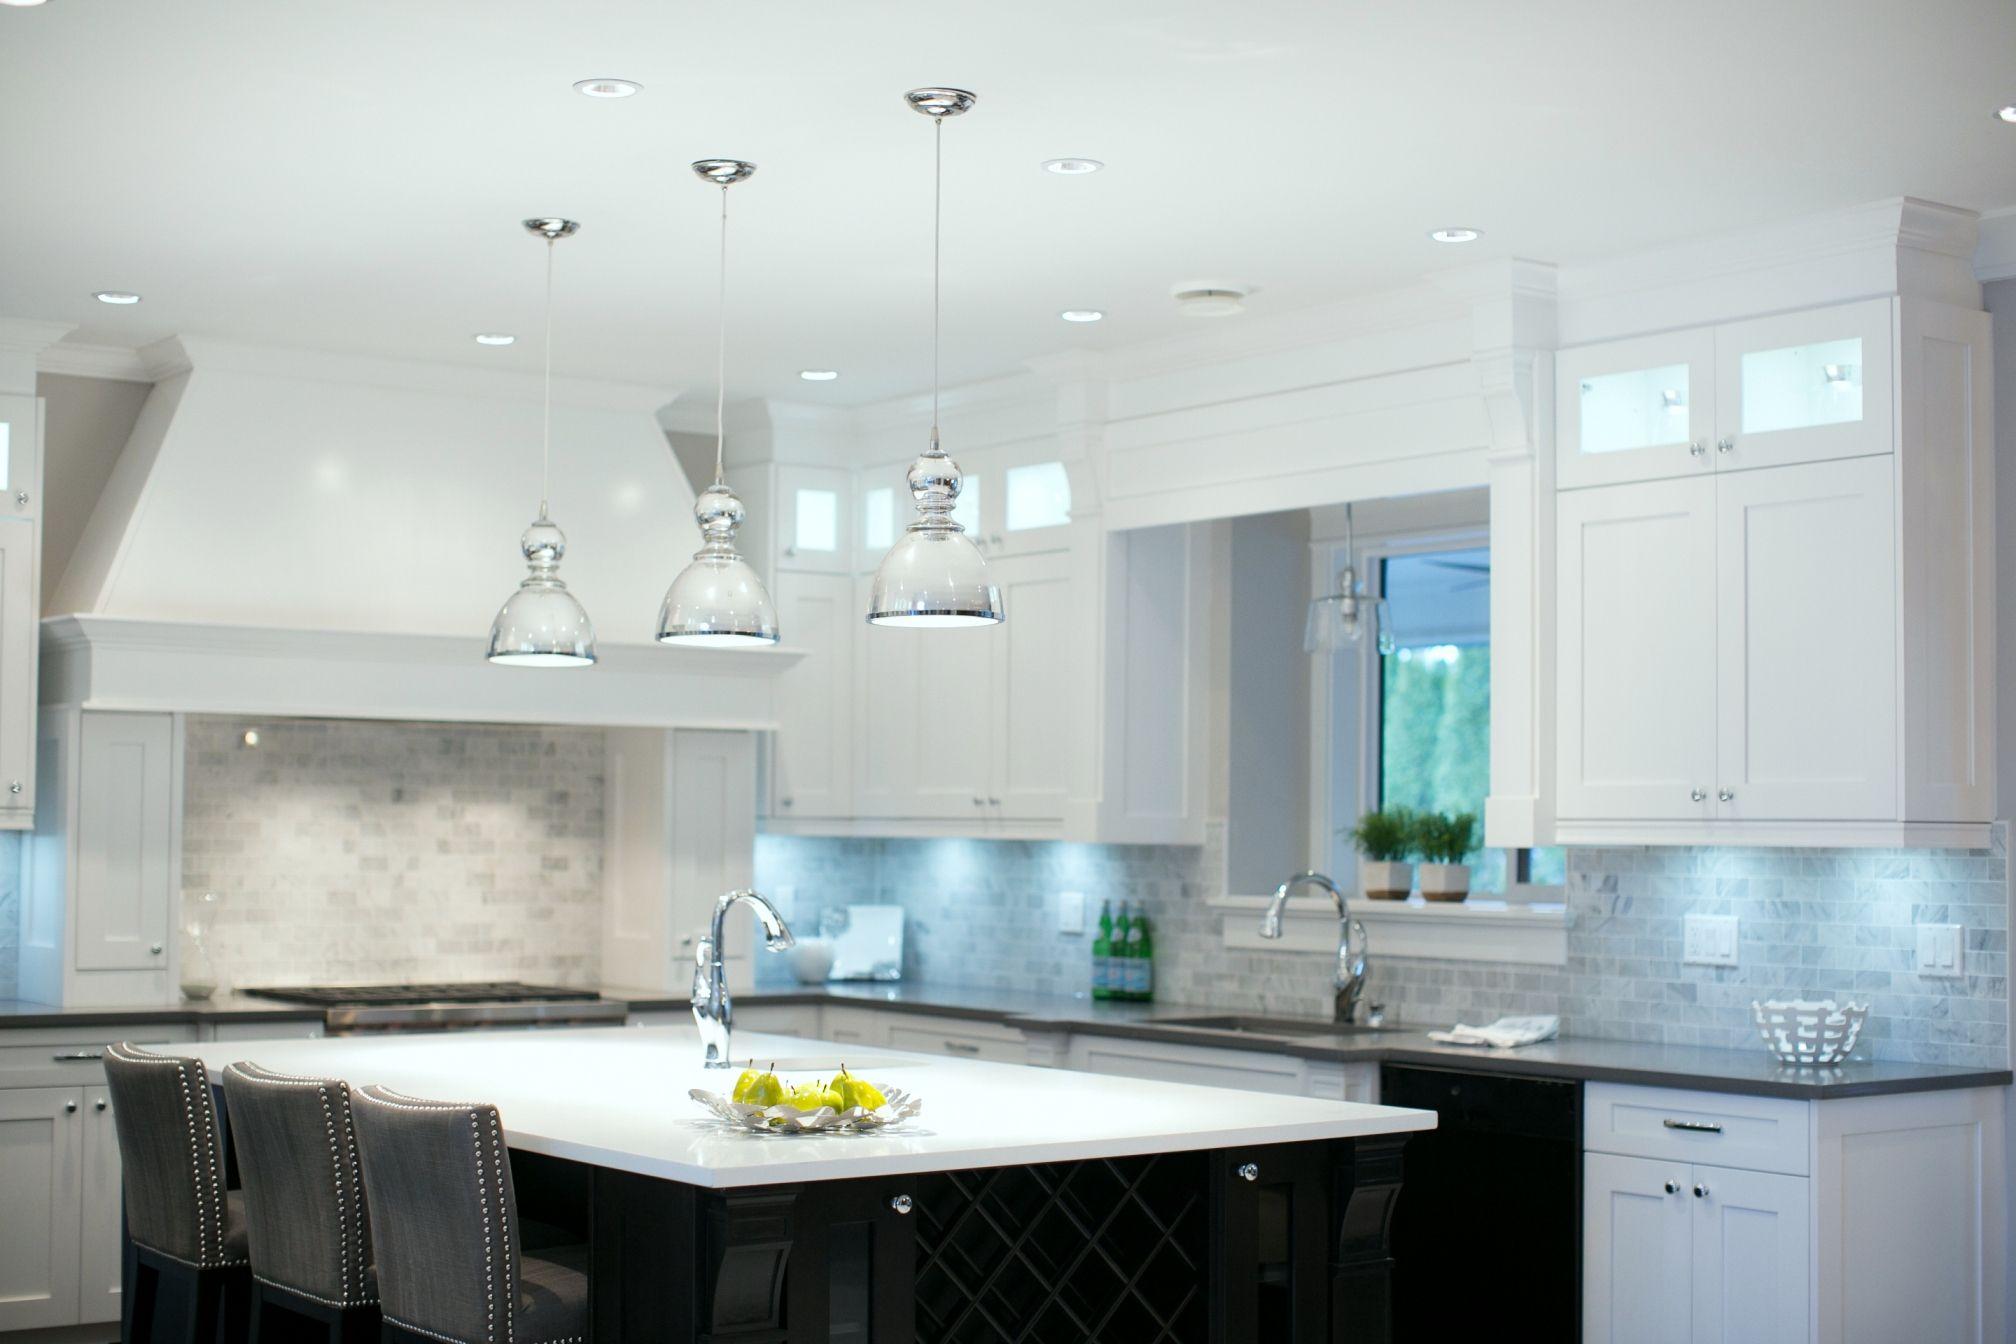 white cabinets, gray quartz countertop and Bianco Carrara 2x4 marble ...